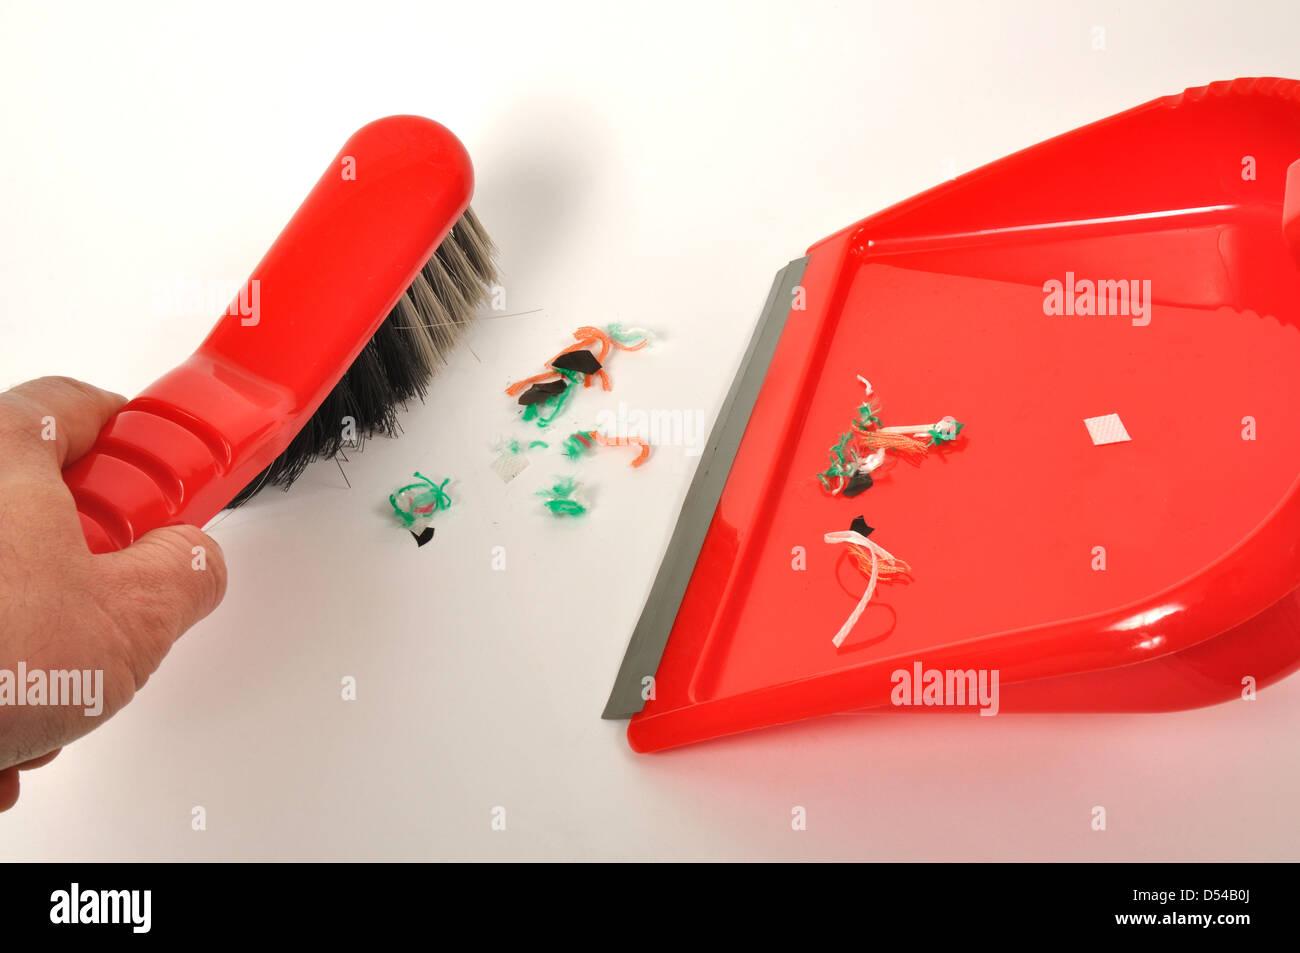 Kehrschaufel und Pinsel Stockbild